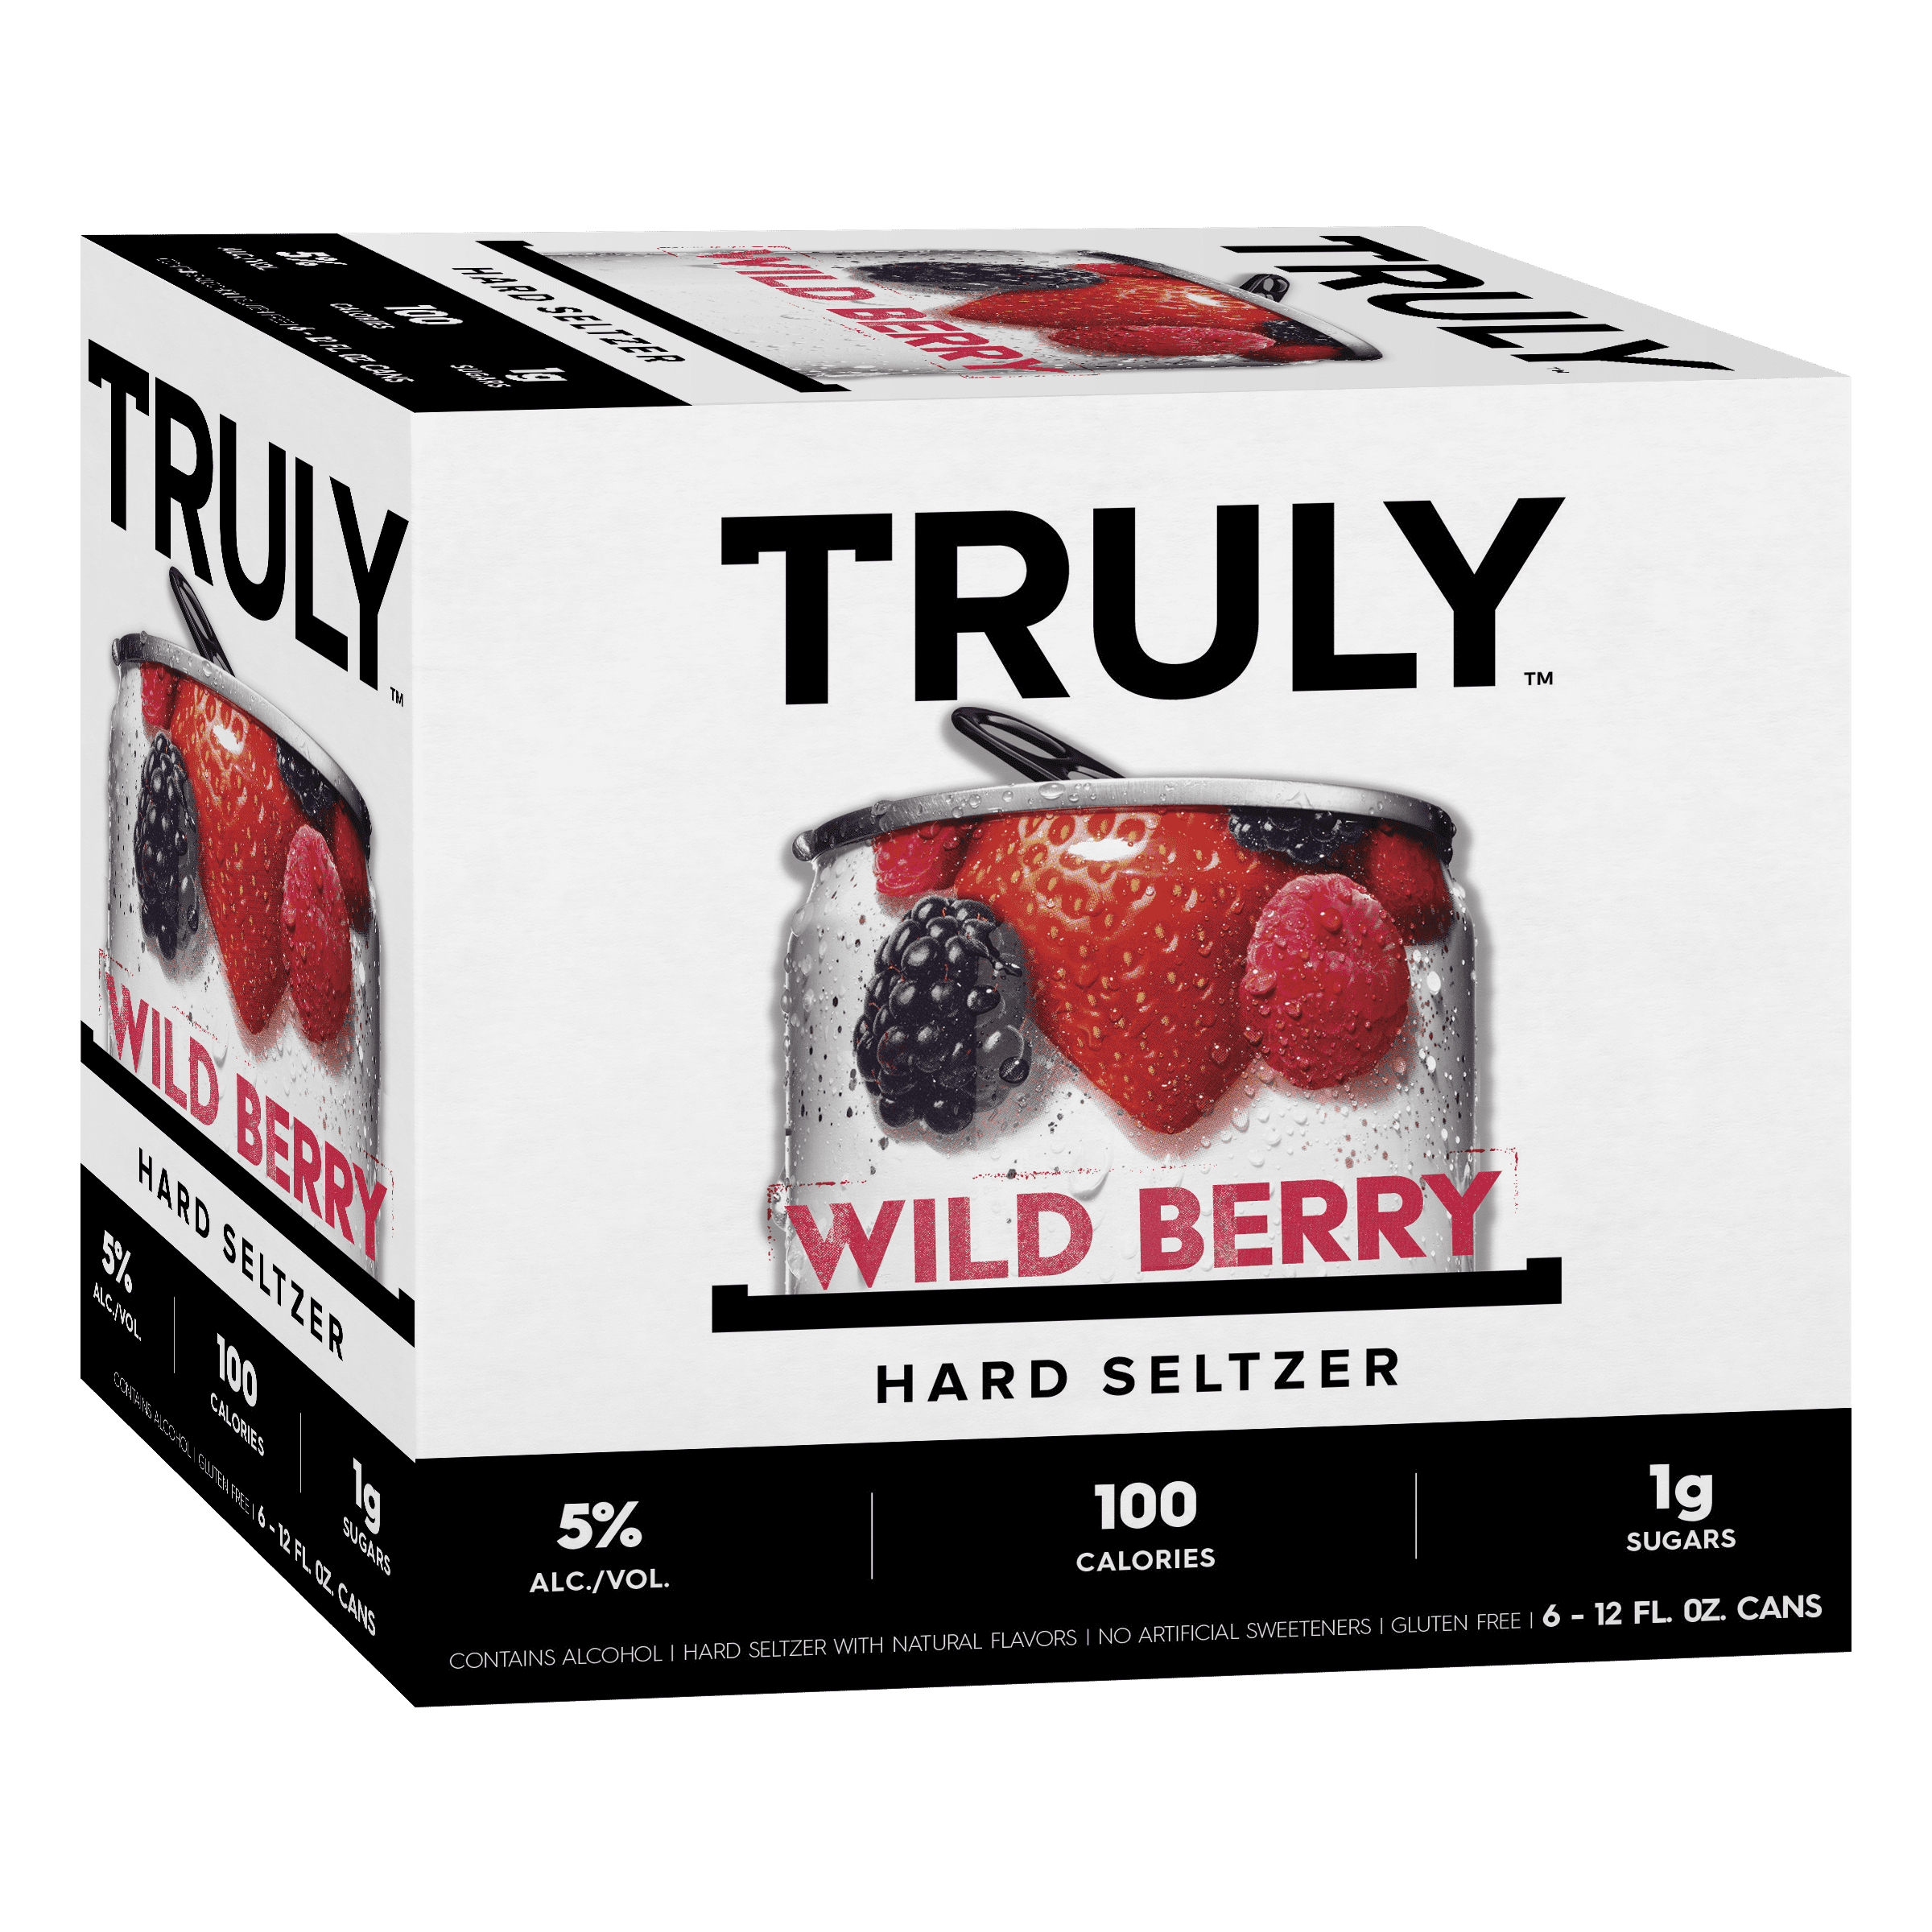 TRULY Hard Seltzer Wild Berry, 6pk, 12oz beer white cans, Gluten Free,  Light - Walmart.com - Walmart.com